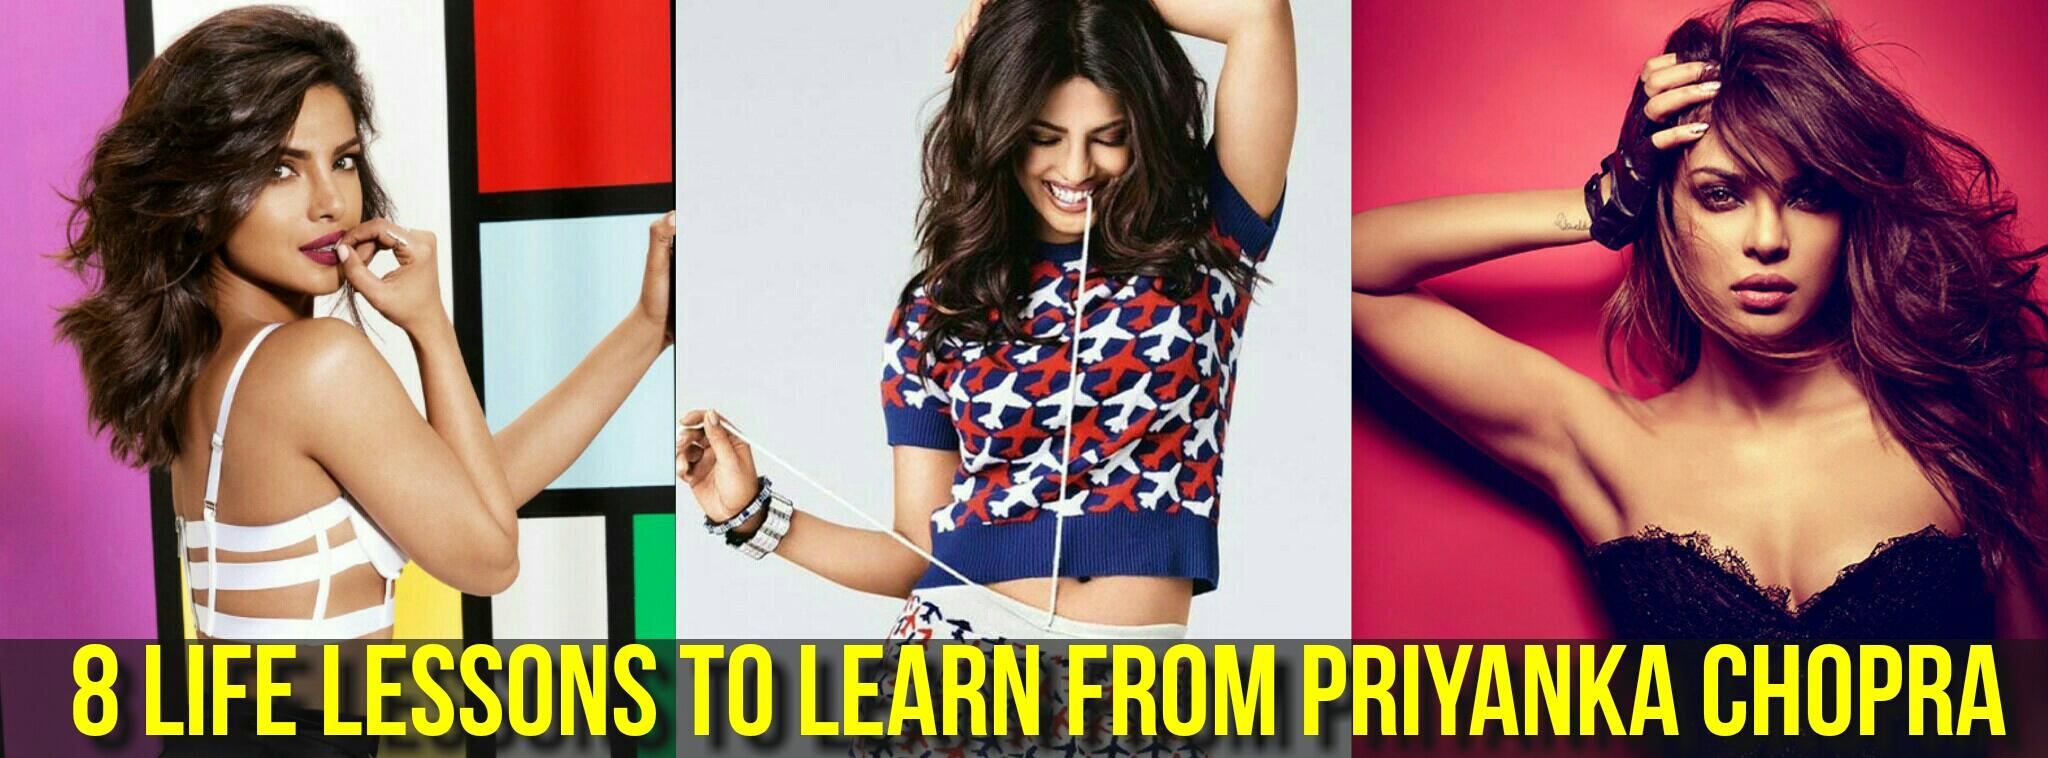 Priyanka Chopra Birthday Special: 8 Life Lessons To Learn From Priyanka Chopra